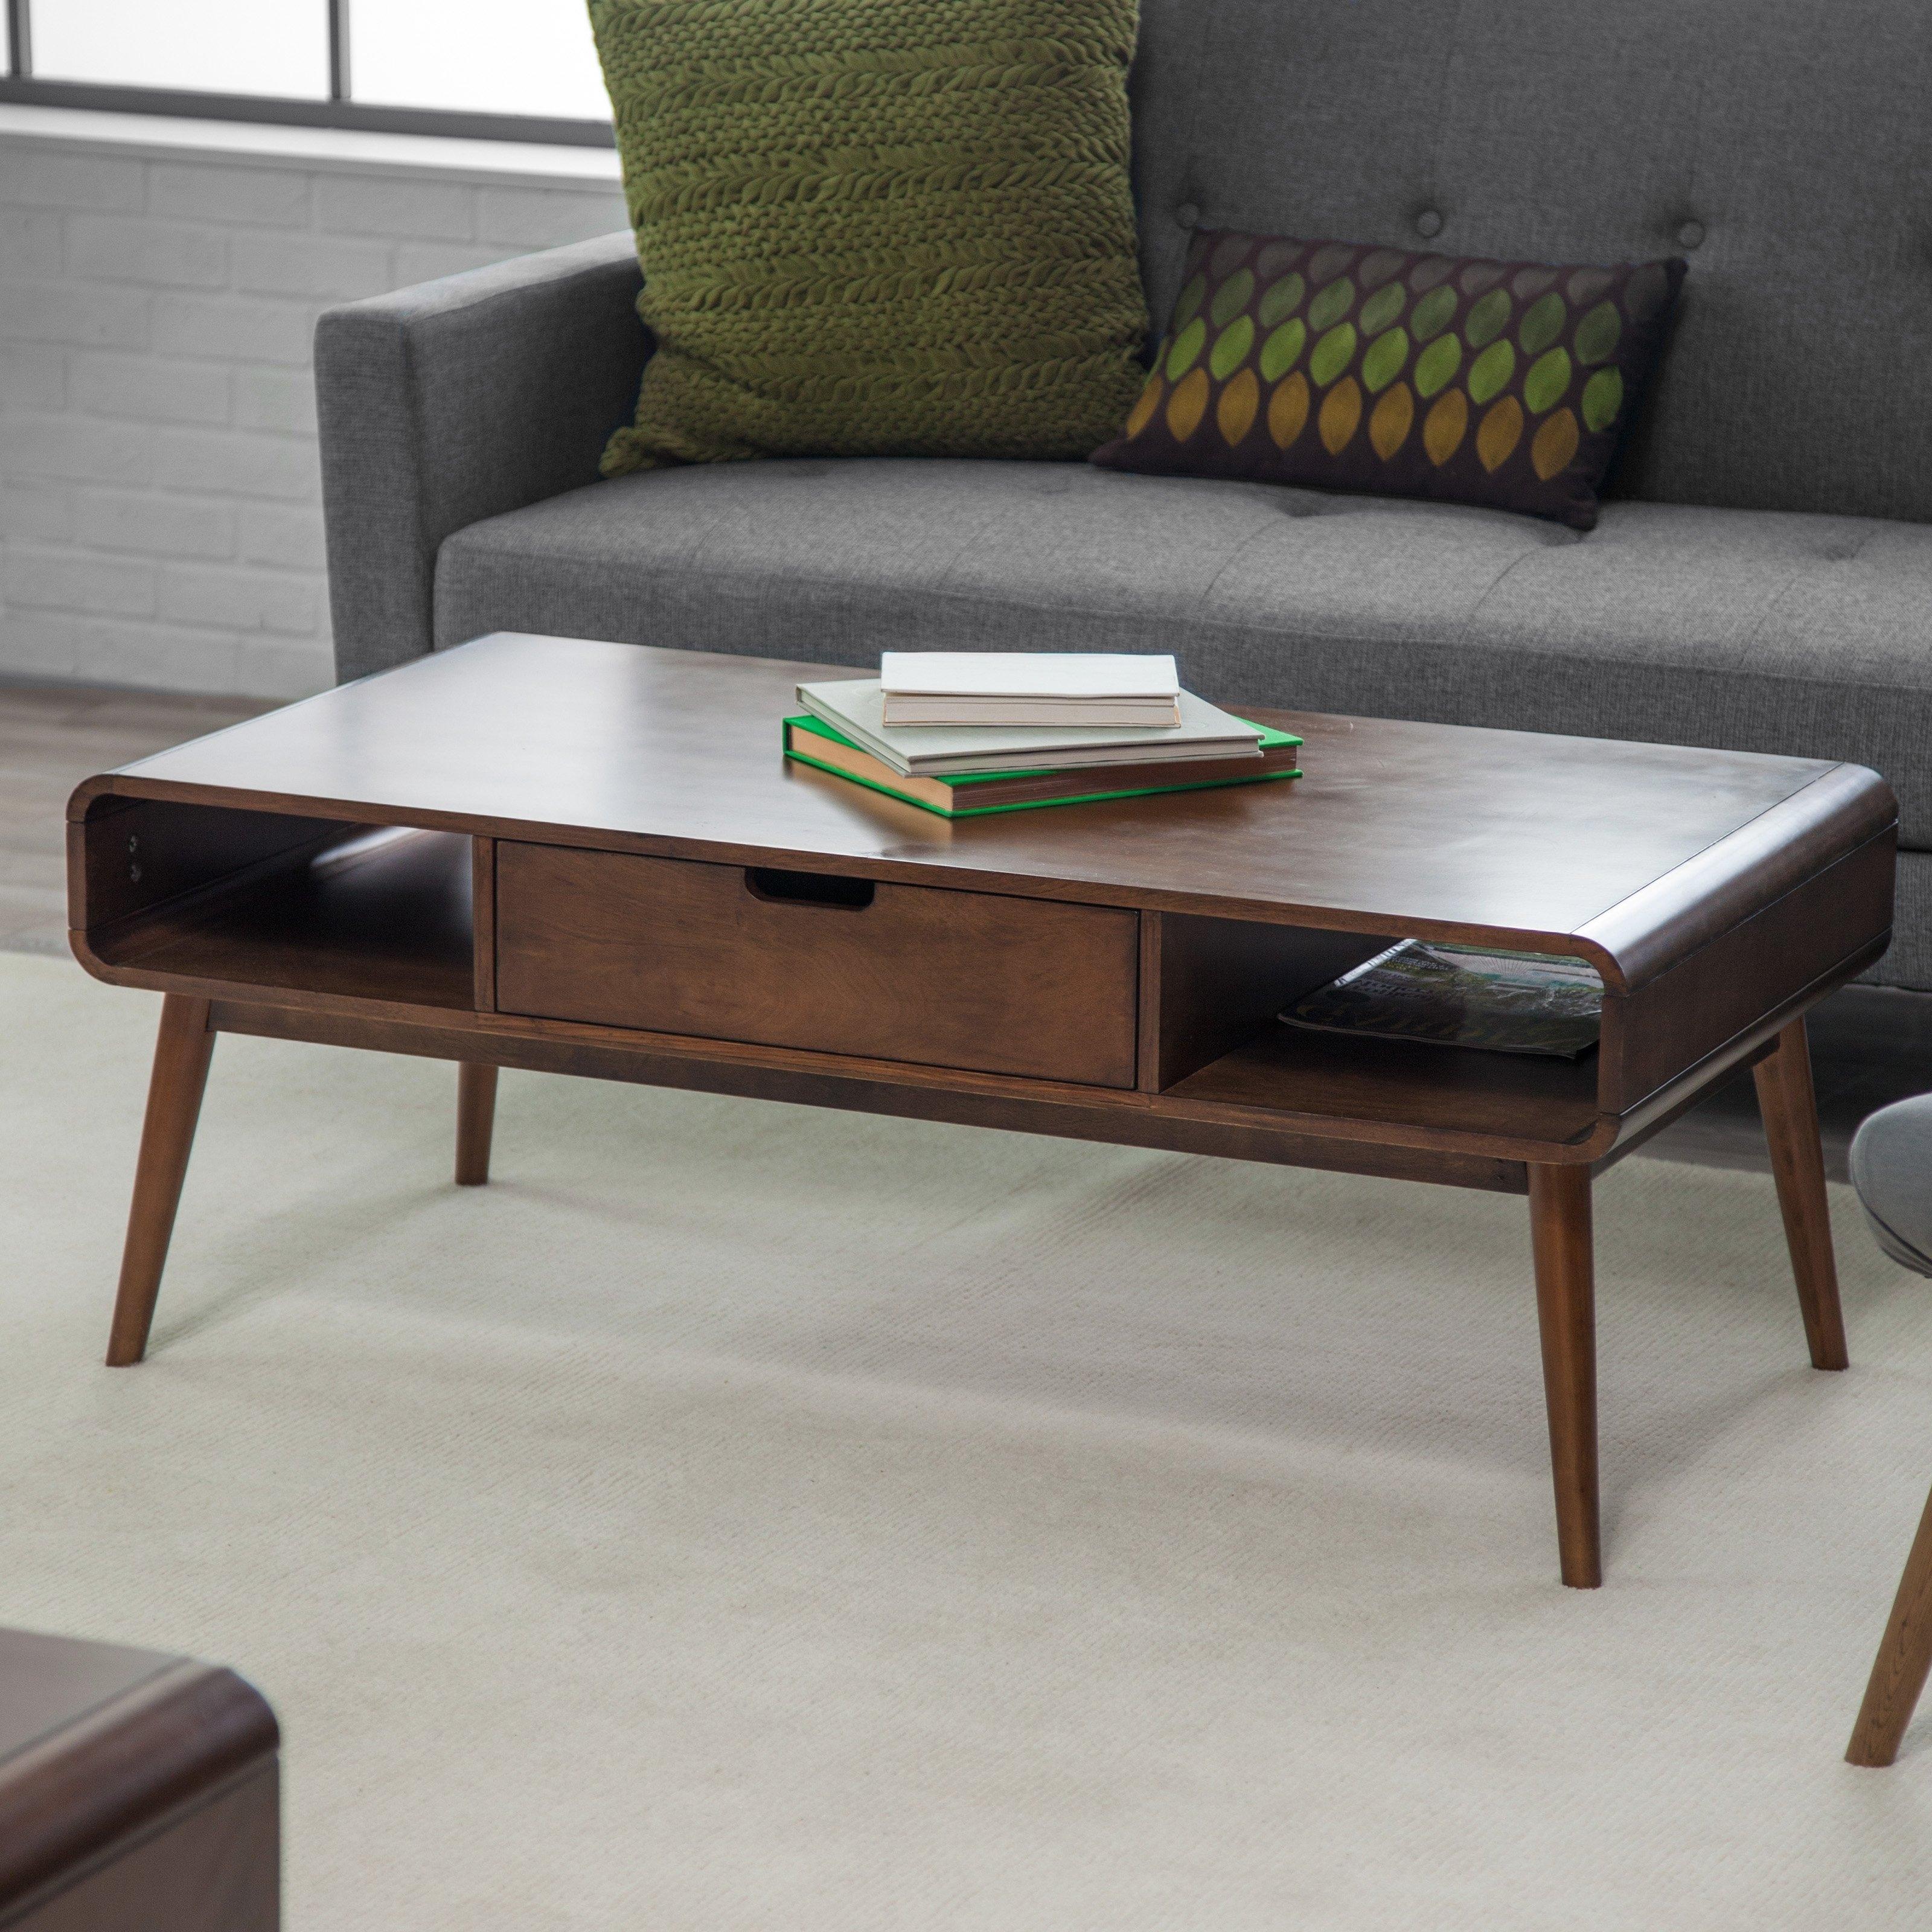 Belham Living Carter Mid Century Modern Coffee Table (View 3 of 20)